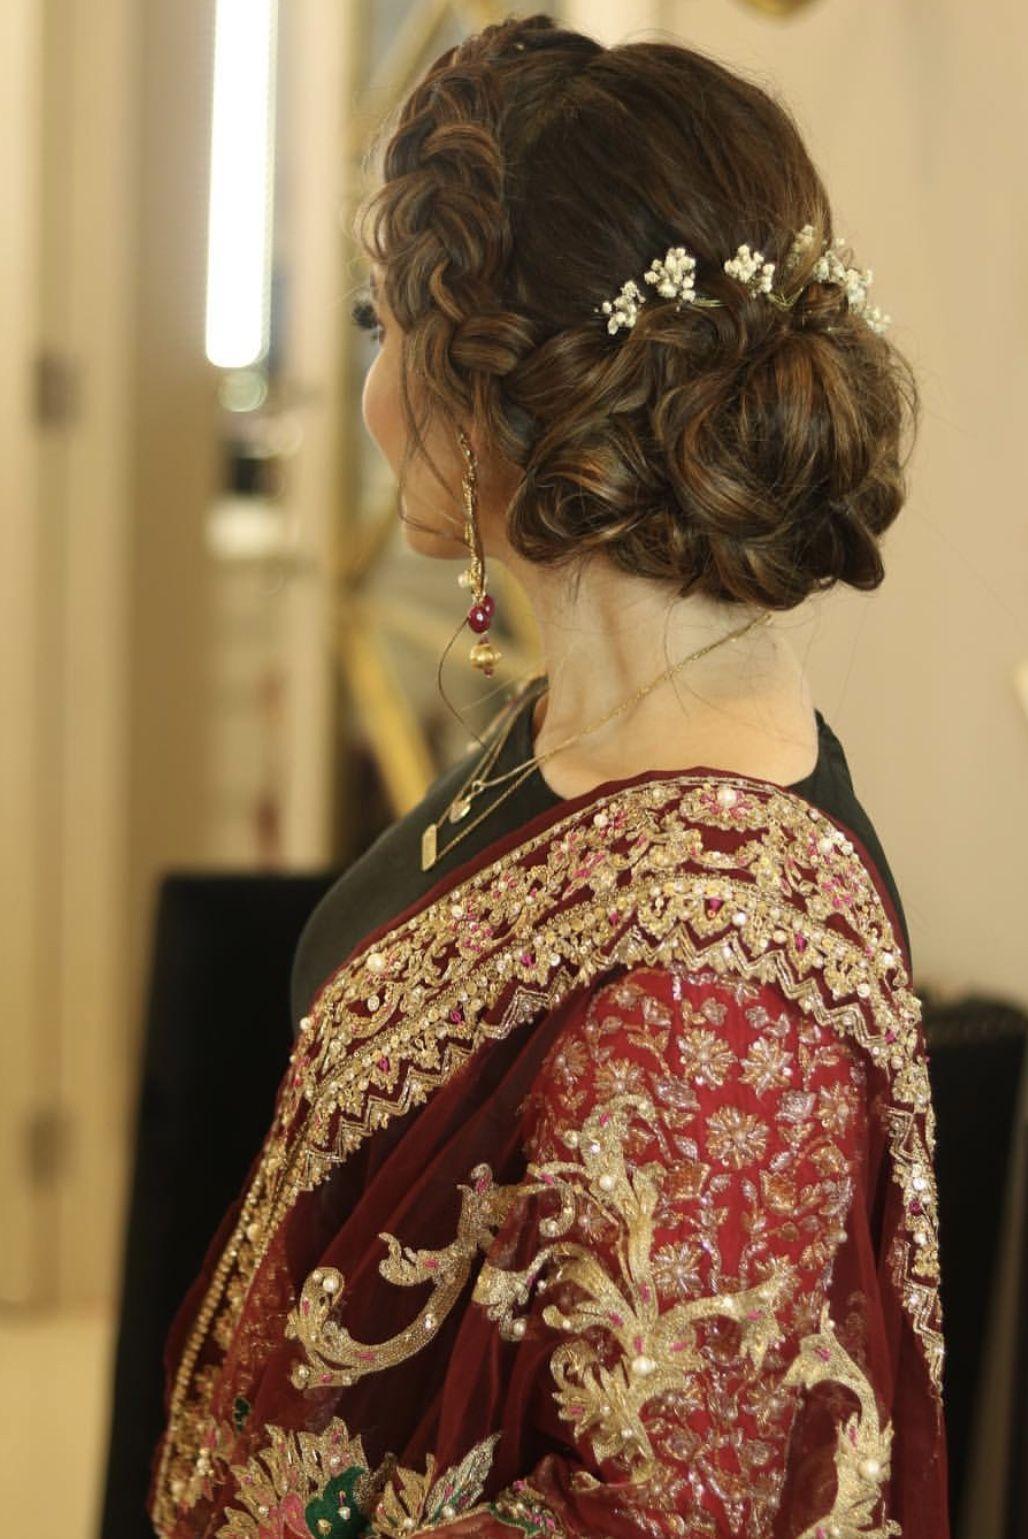 Pinterest Abeera Mehar Pakistani Hair Hair Styles Bridal Hair Buns